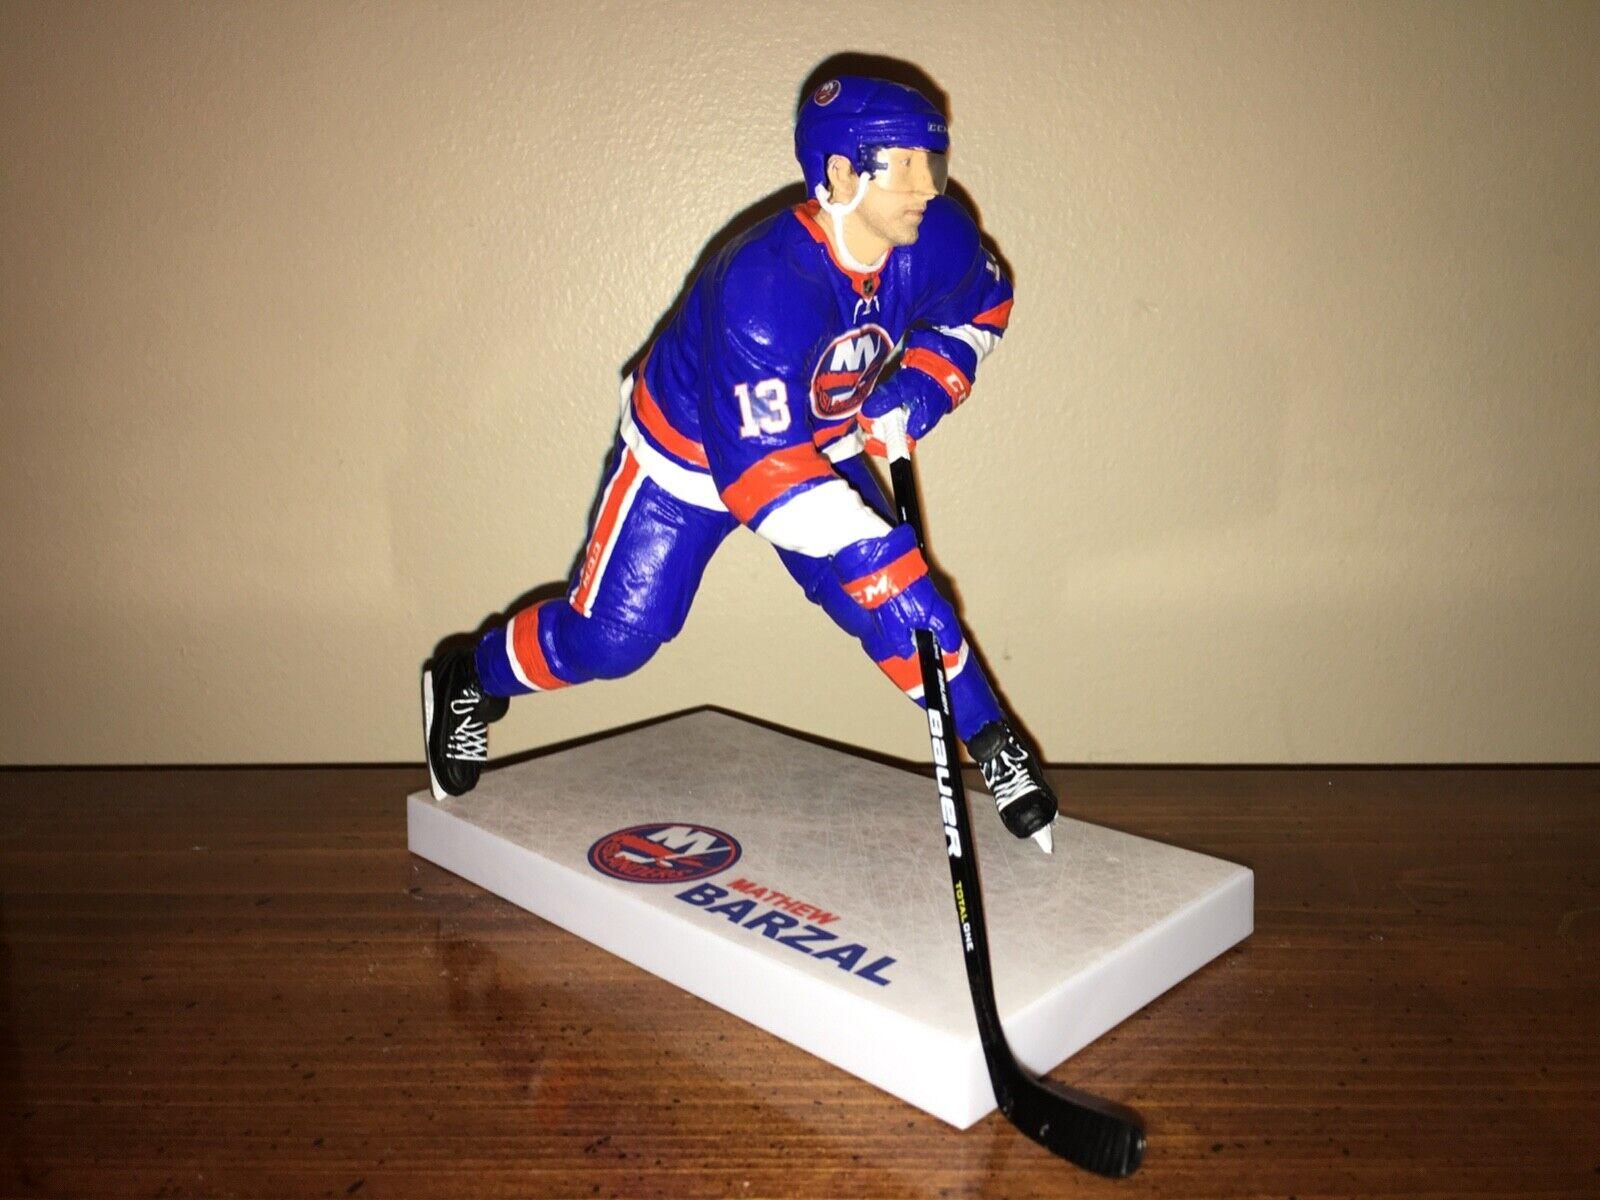 McFarlane NHL Personalizado Mathew Barzal New York Islanders